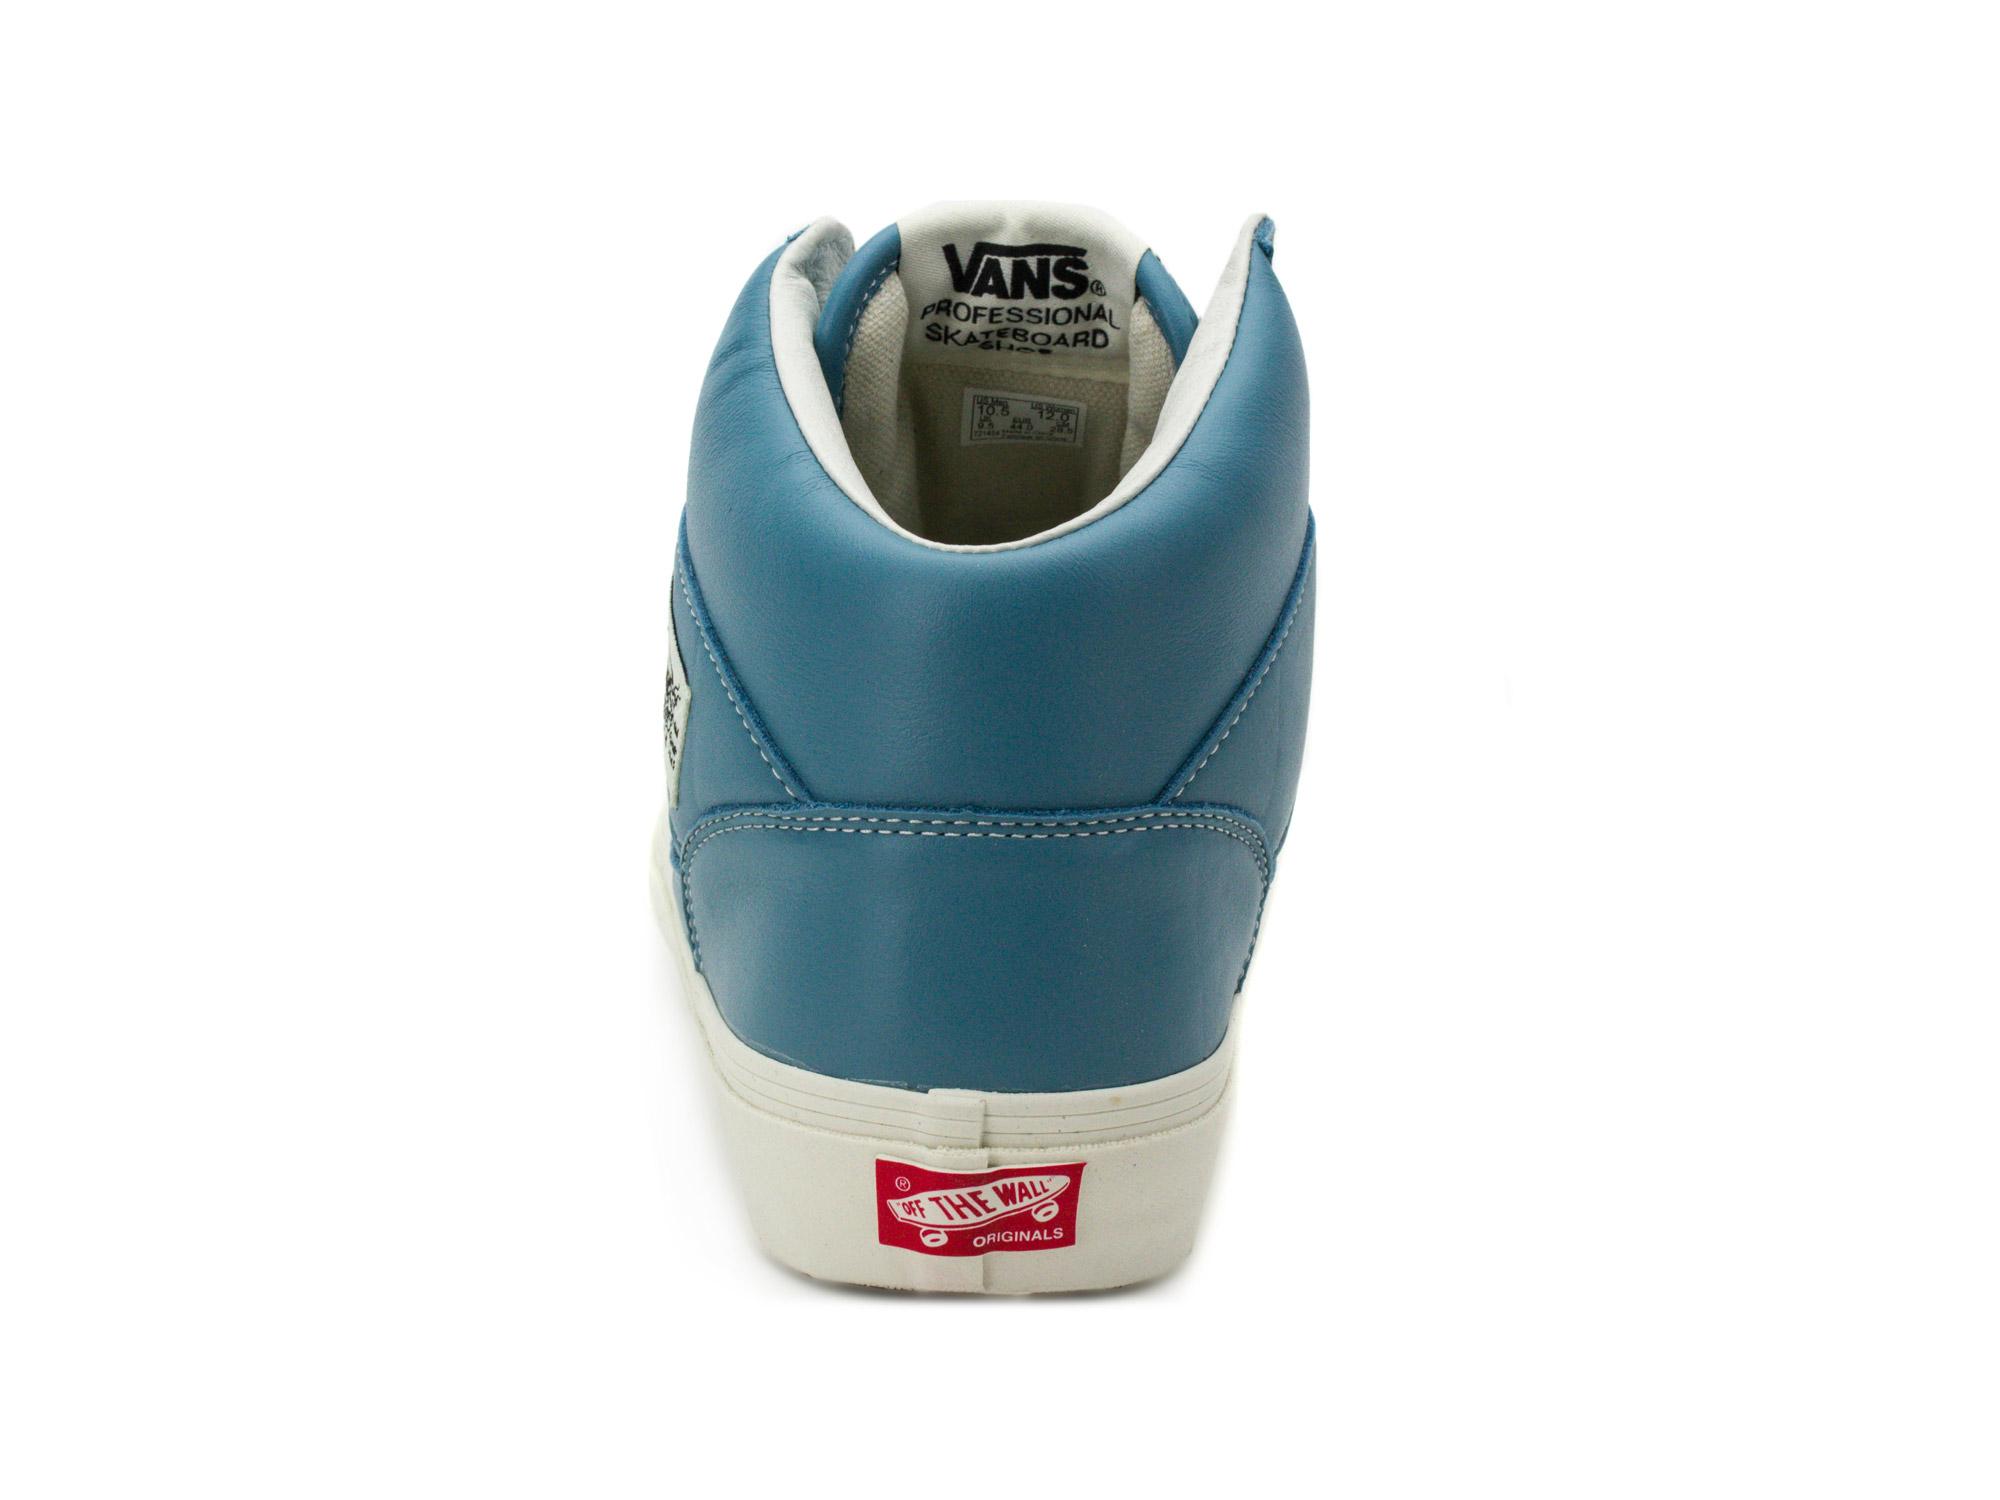 Vans Mens OG Full Cab LX Leather Adriatic Blue VN0A3JOZORQ